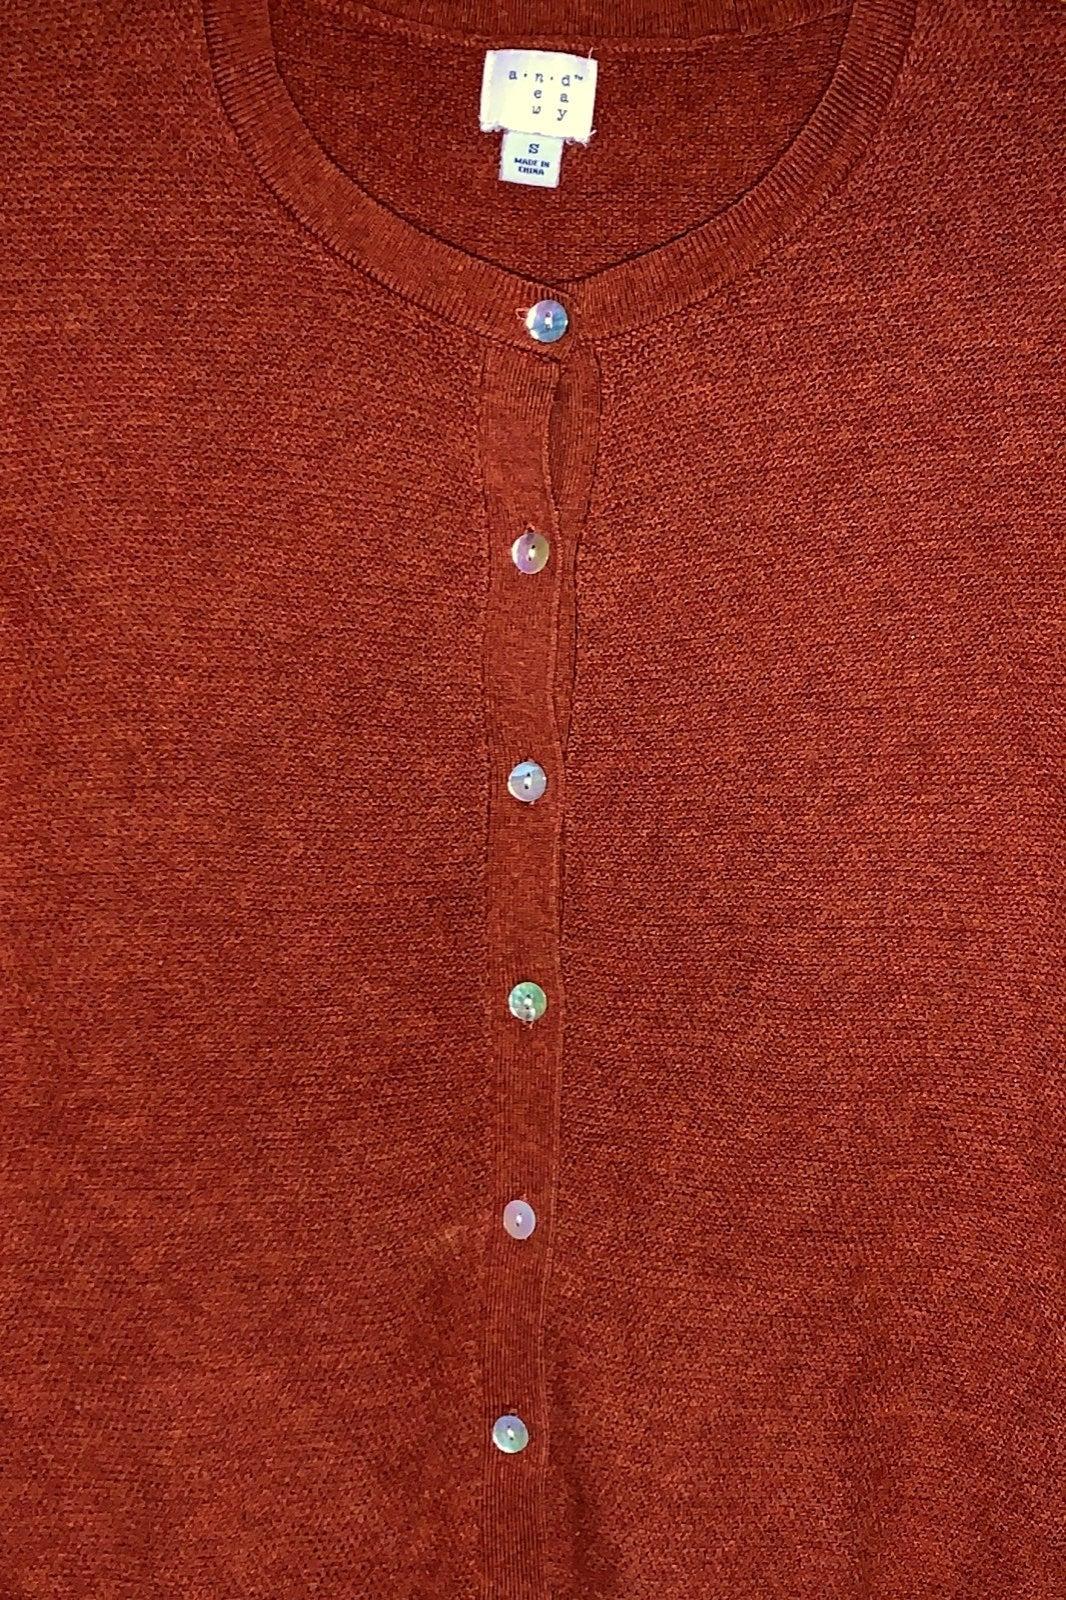 Rust crew neck button down sweater class